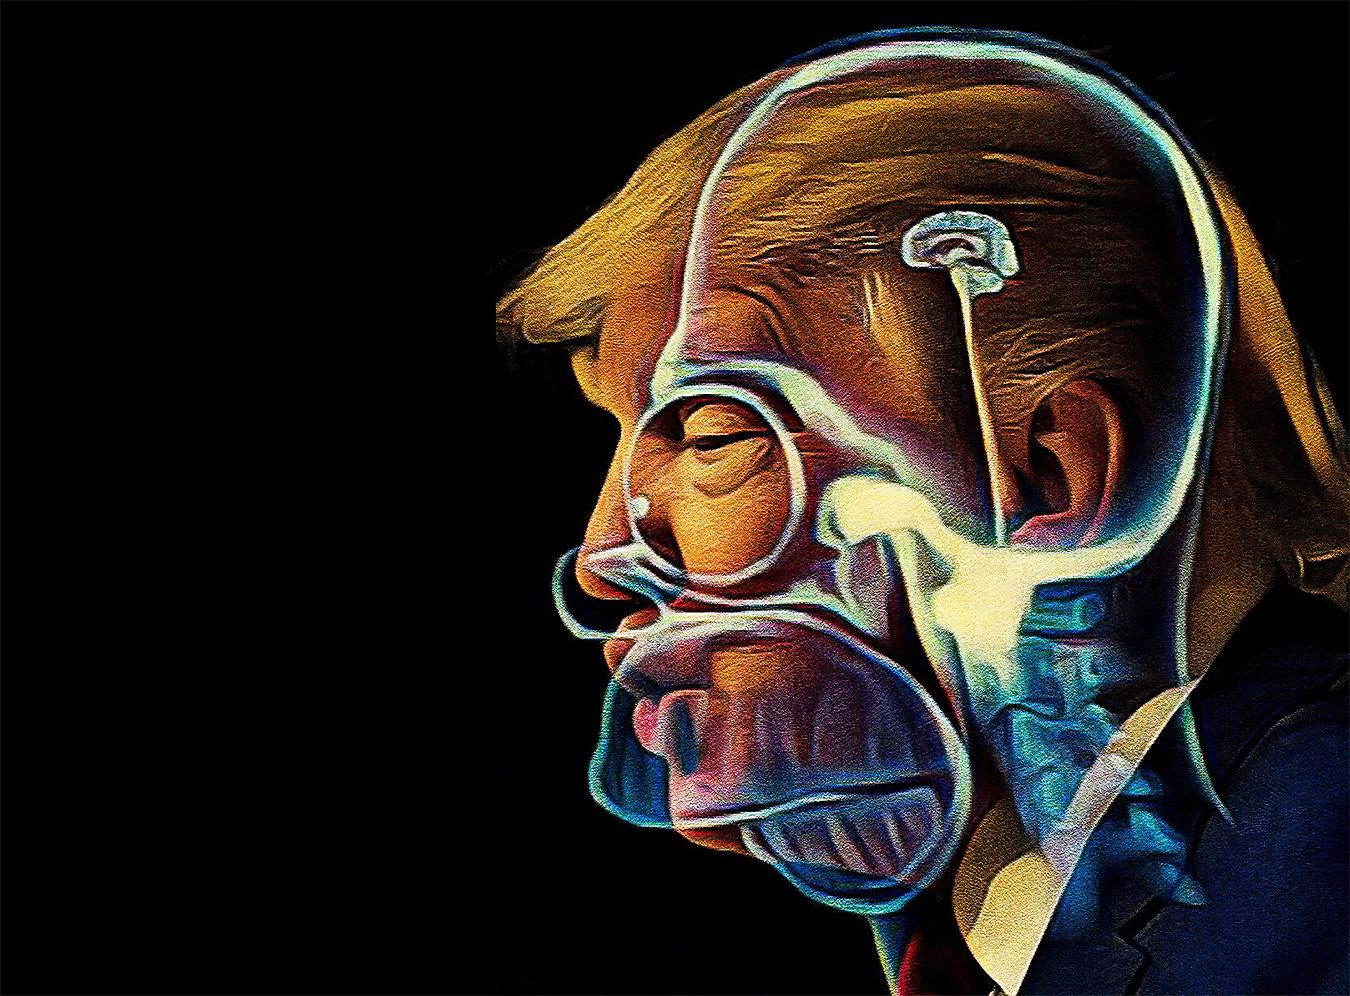 Artwork_Eustace_Pilgram_Trump_bad_President_brain_vortex_illustration_cool_art_politics